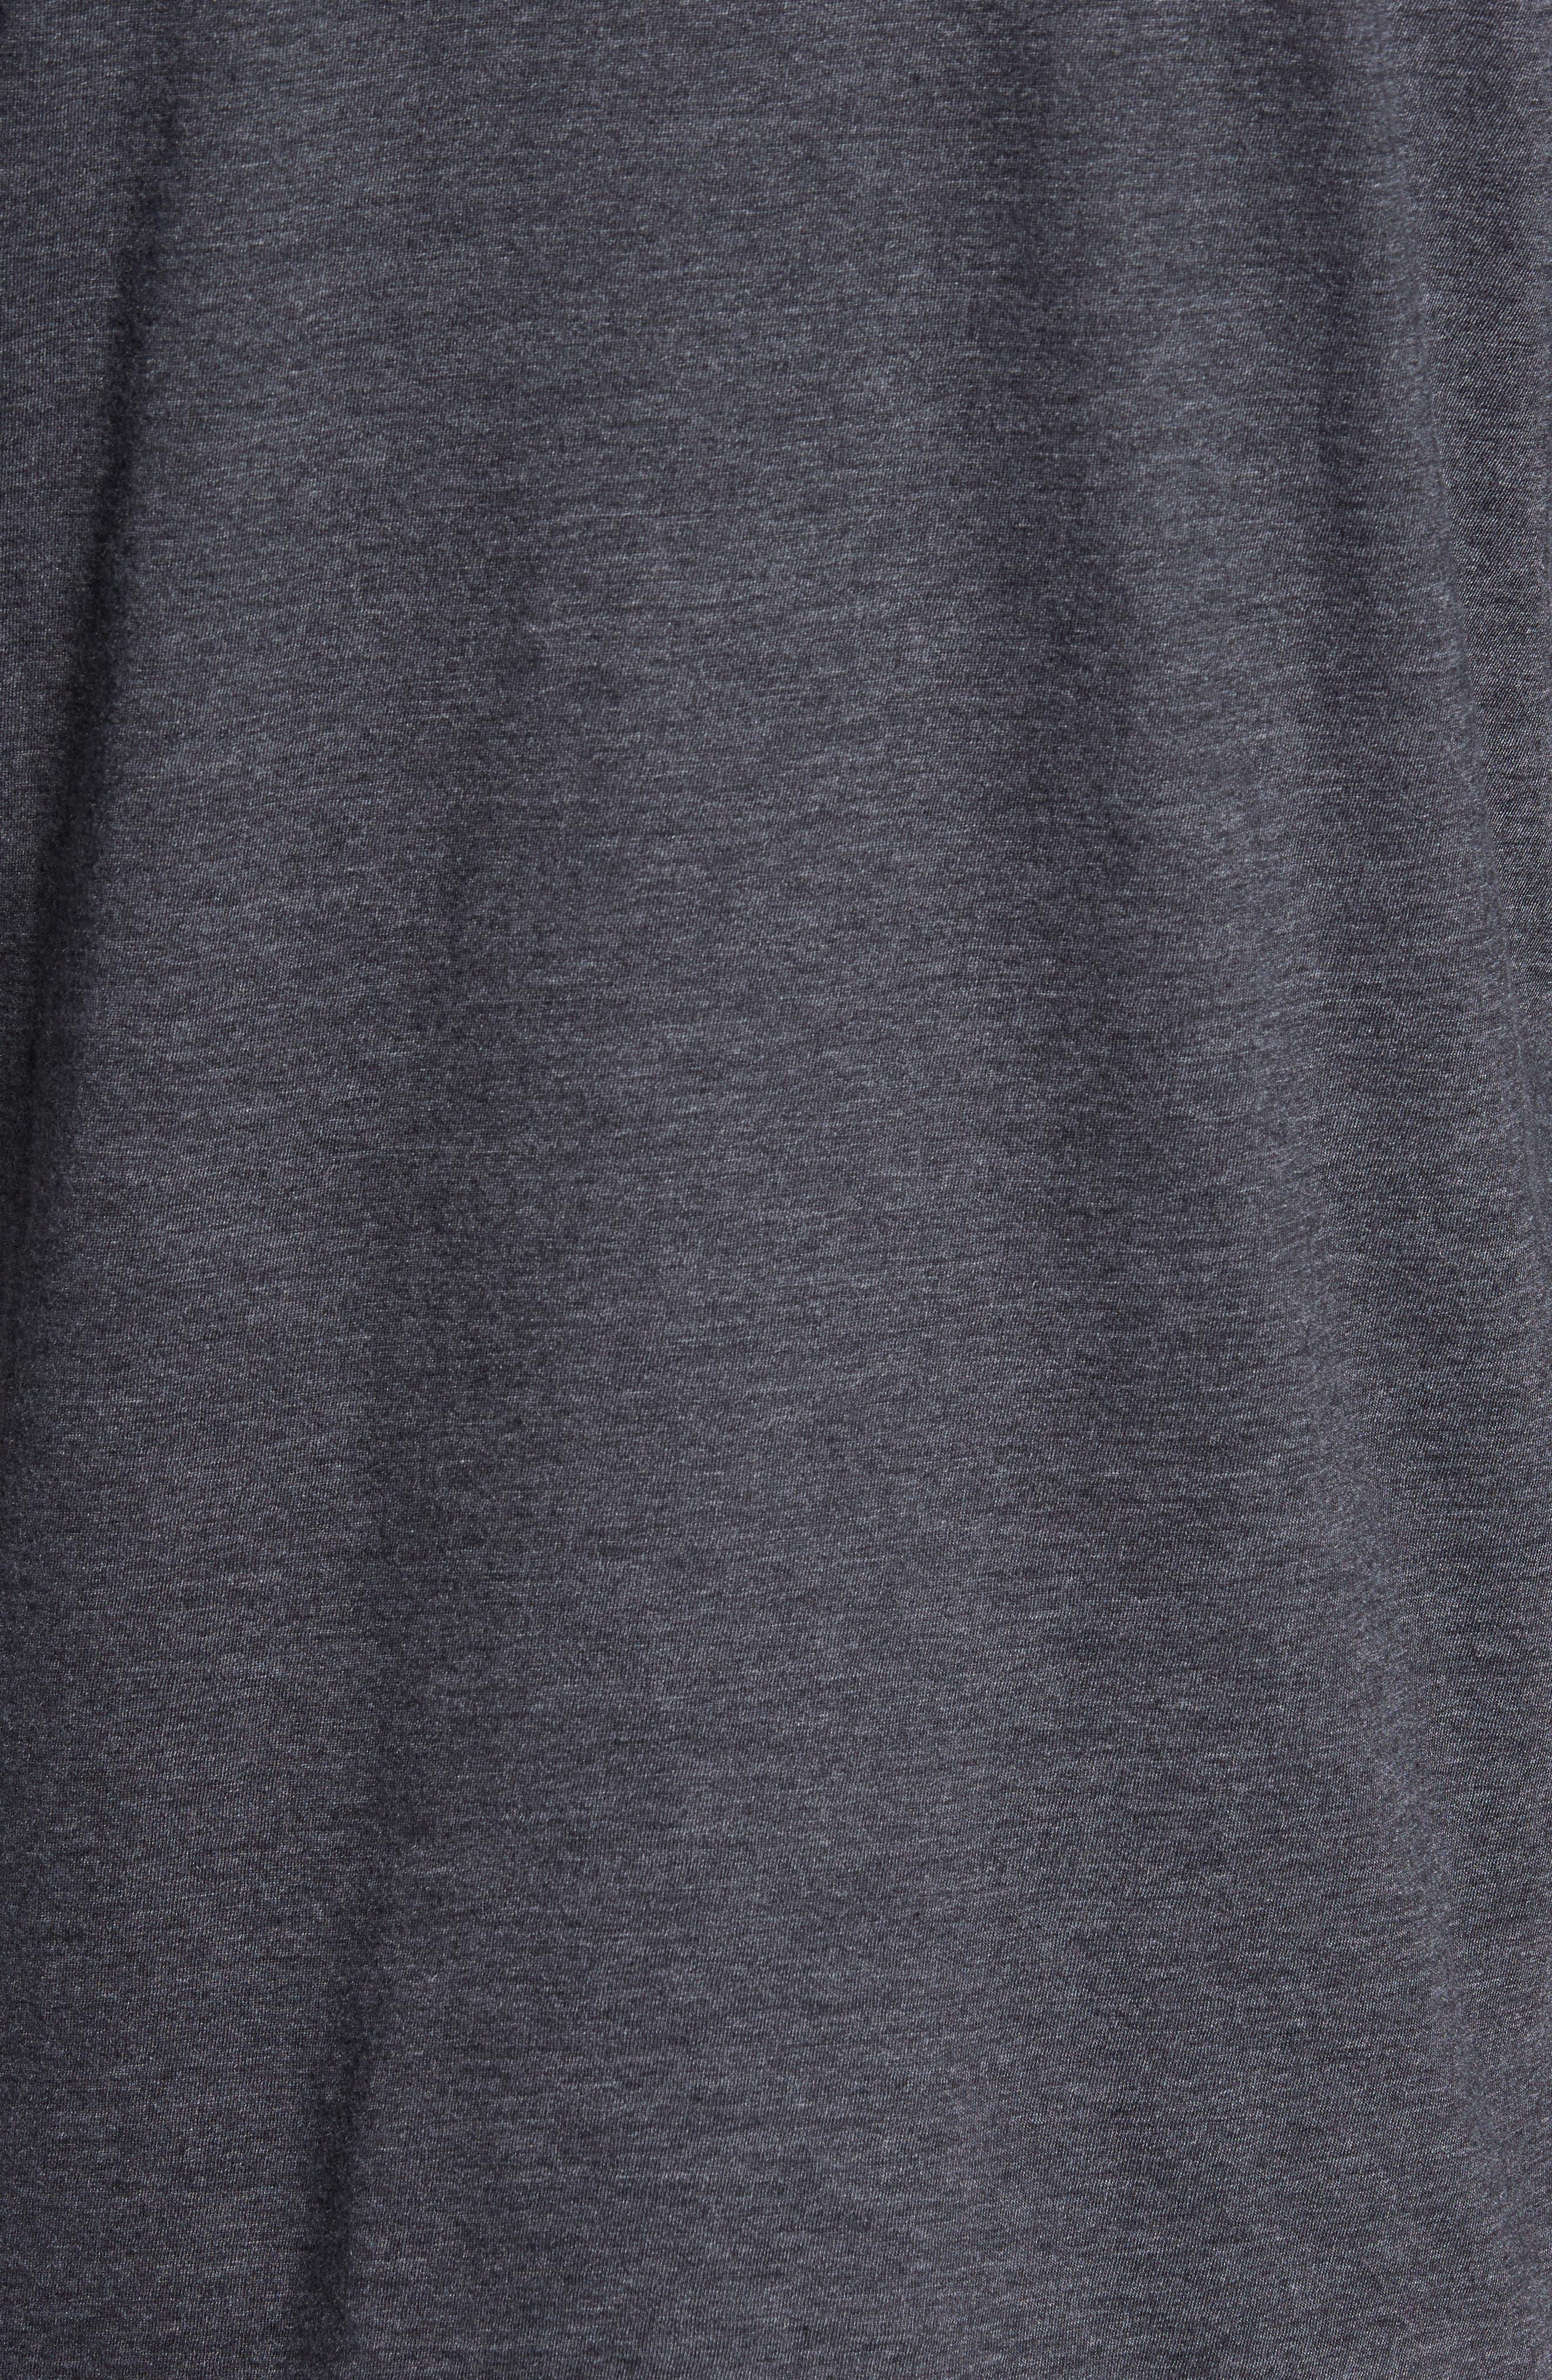 Prigus Sport Team T-Shirt,                             Alternate thumbnail 5, color,                             001